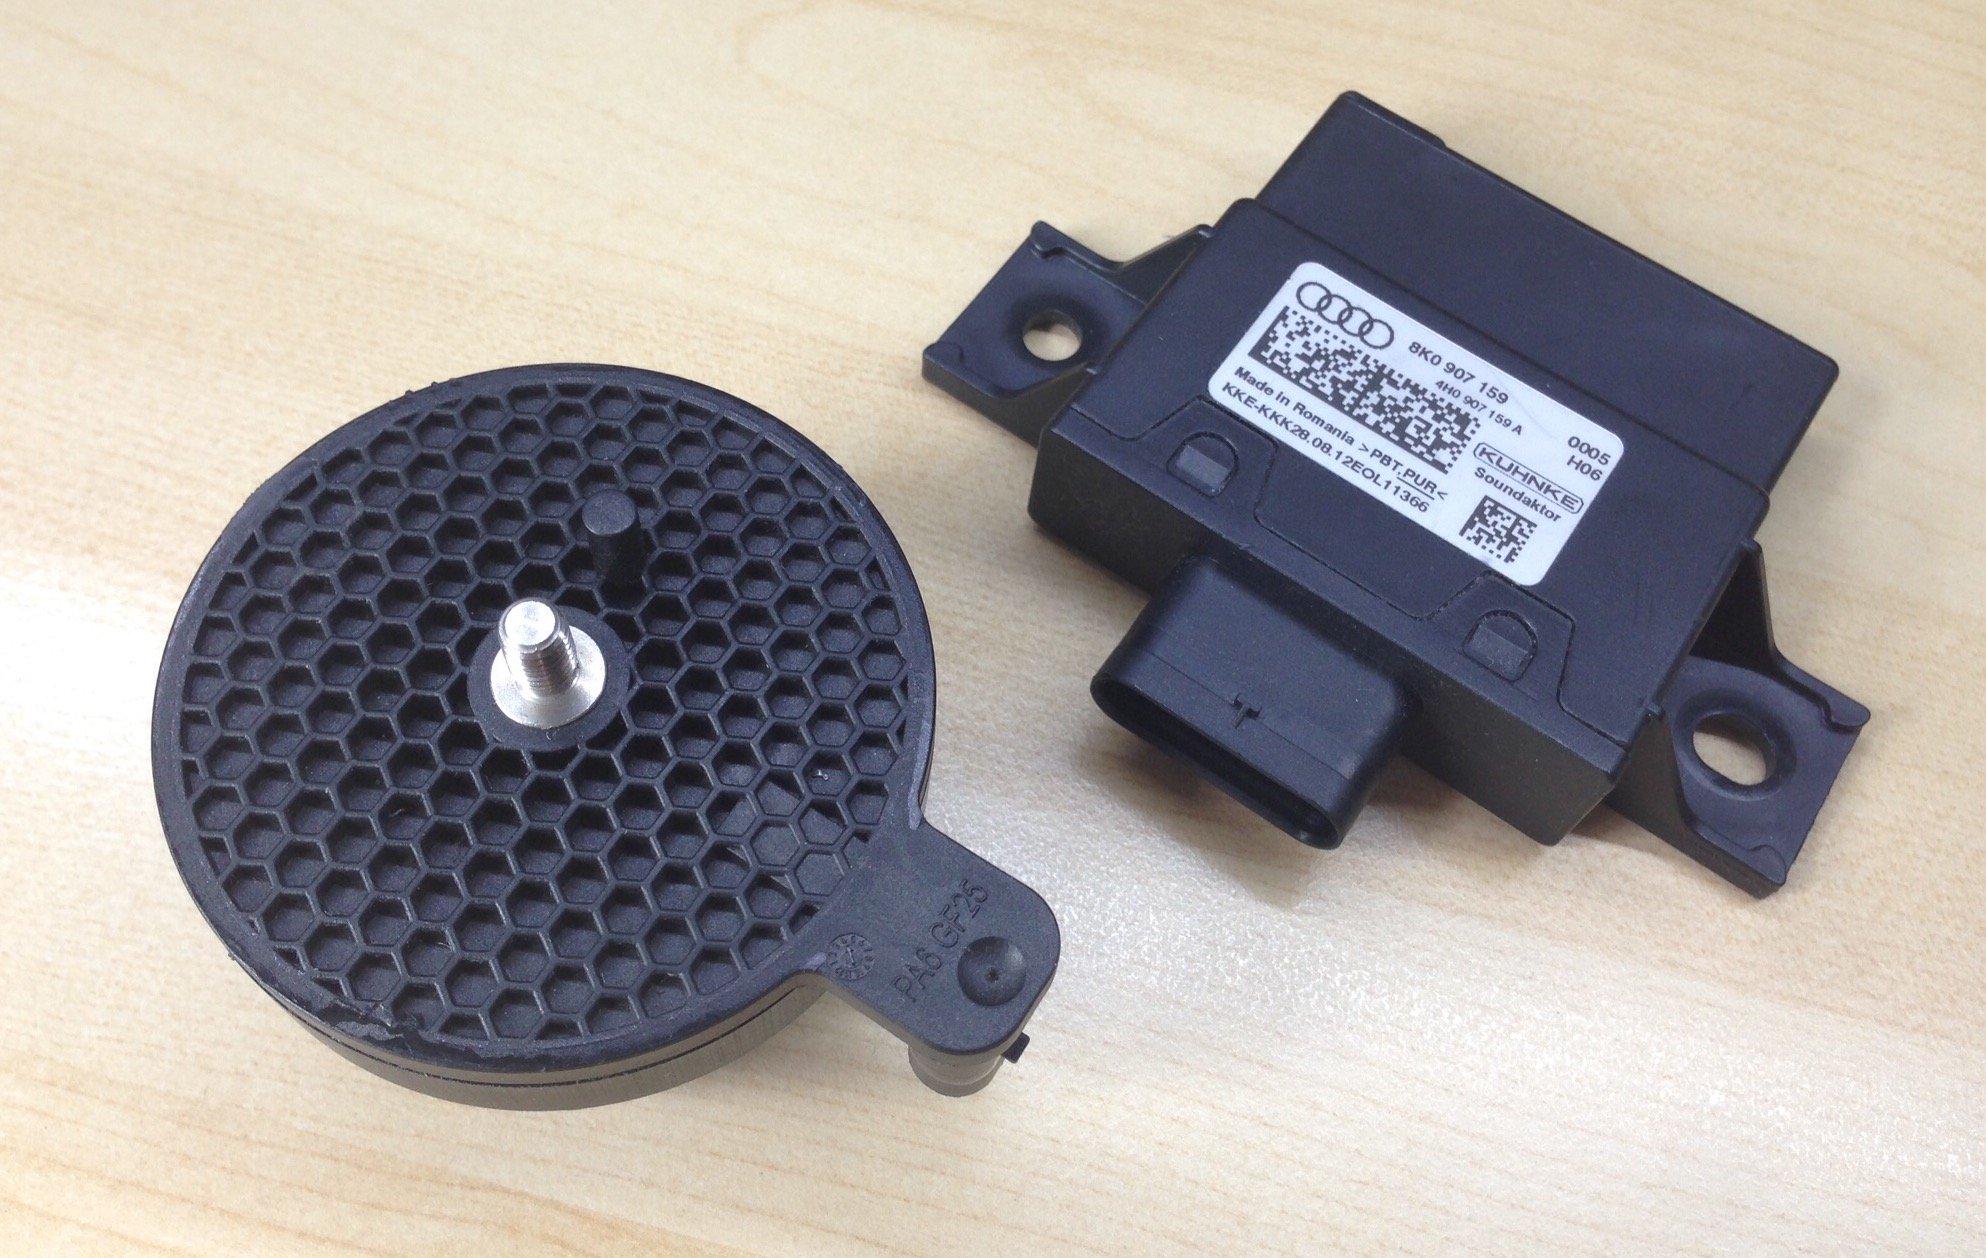 Mk7 Golf Sound Aktuator Retrofit